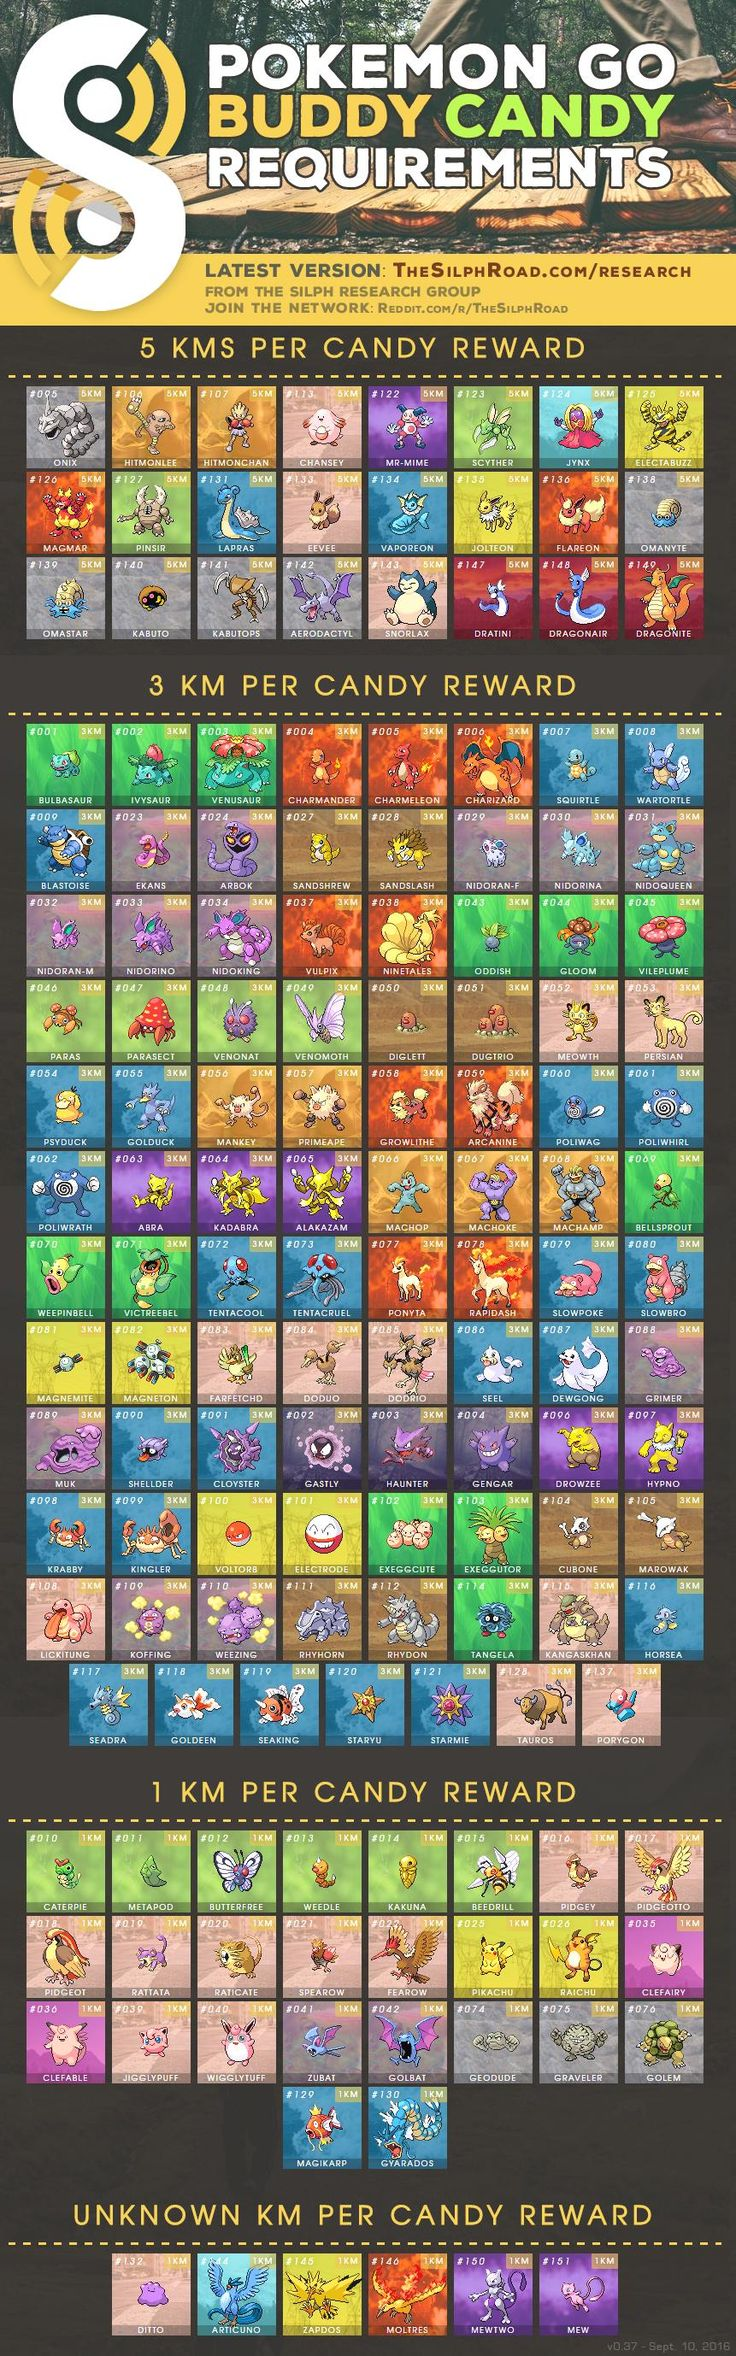 Get unlimited Pokécoins! Get it here: Jennifer Gunn.coins #coins #freecoins #generator #good #cute #follow #fun #like4like #followme #pokemongo #pokemon :burrito: